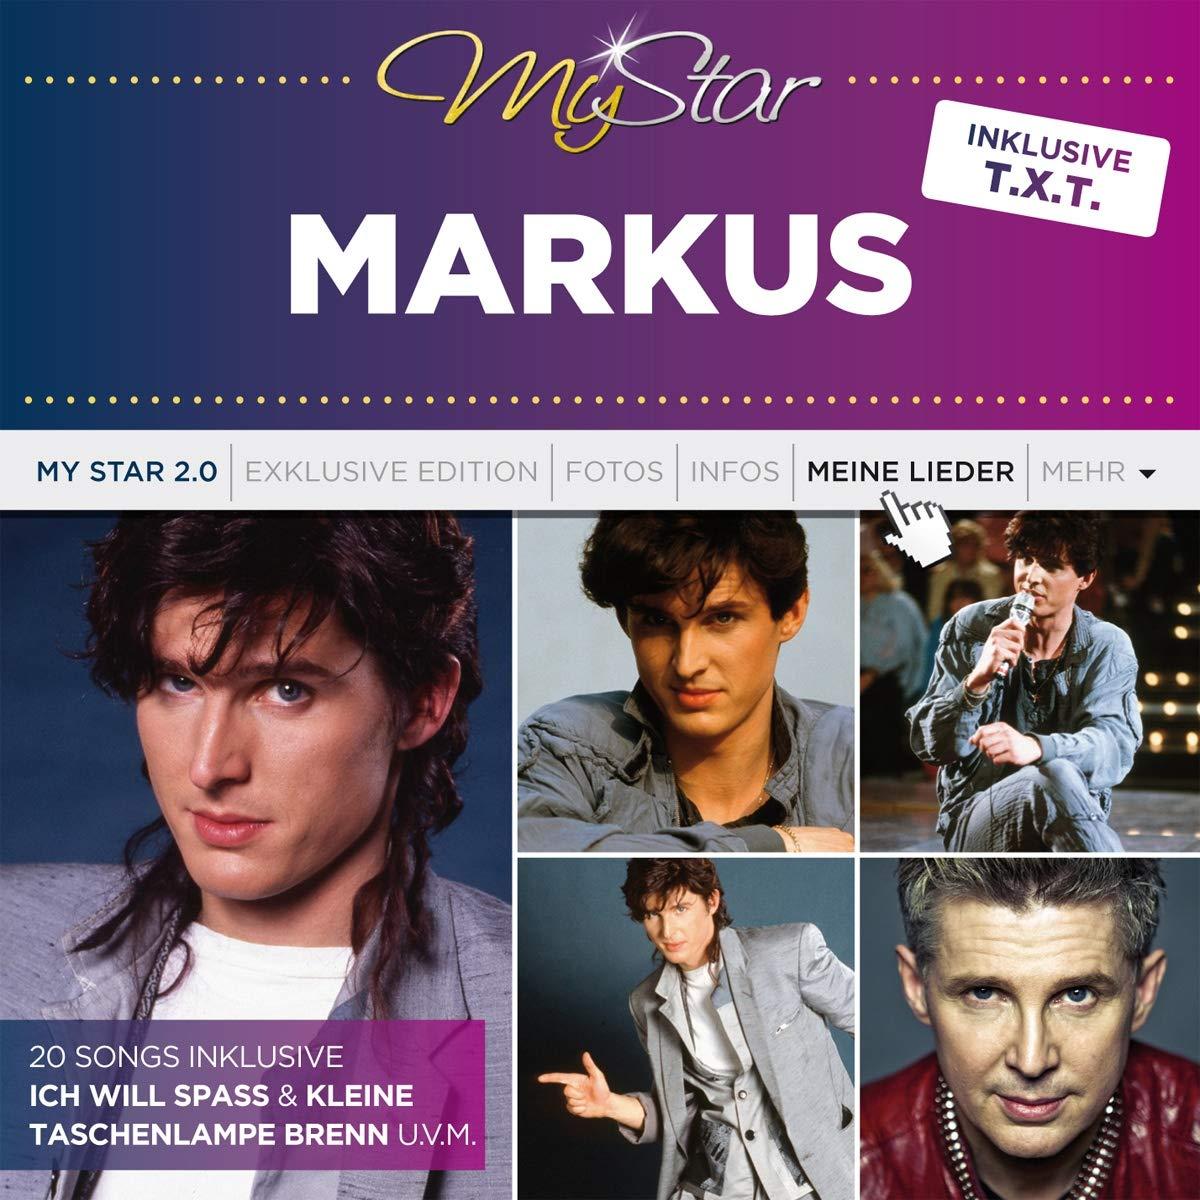 MARKUS - My Star